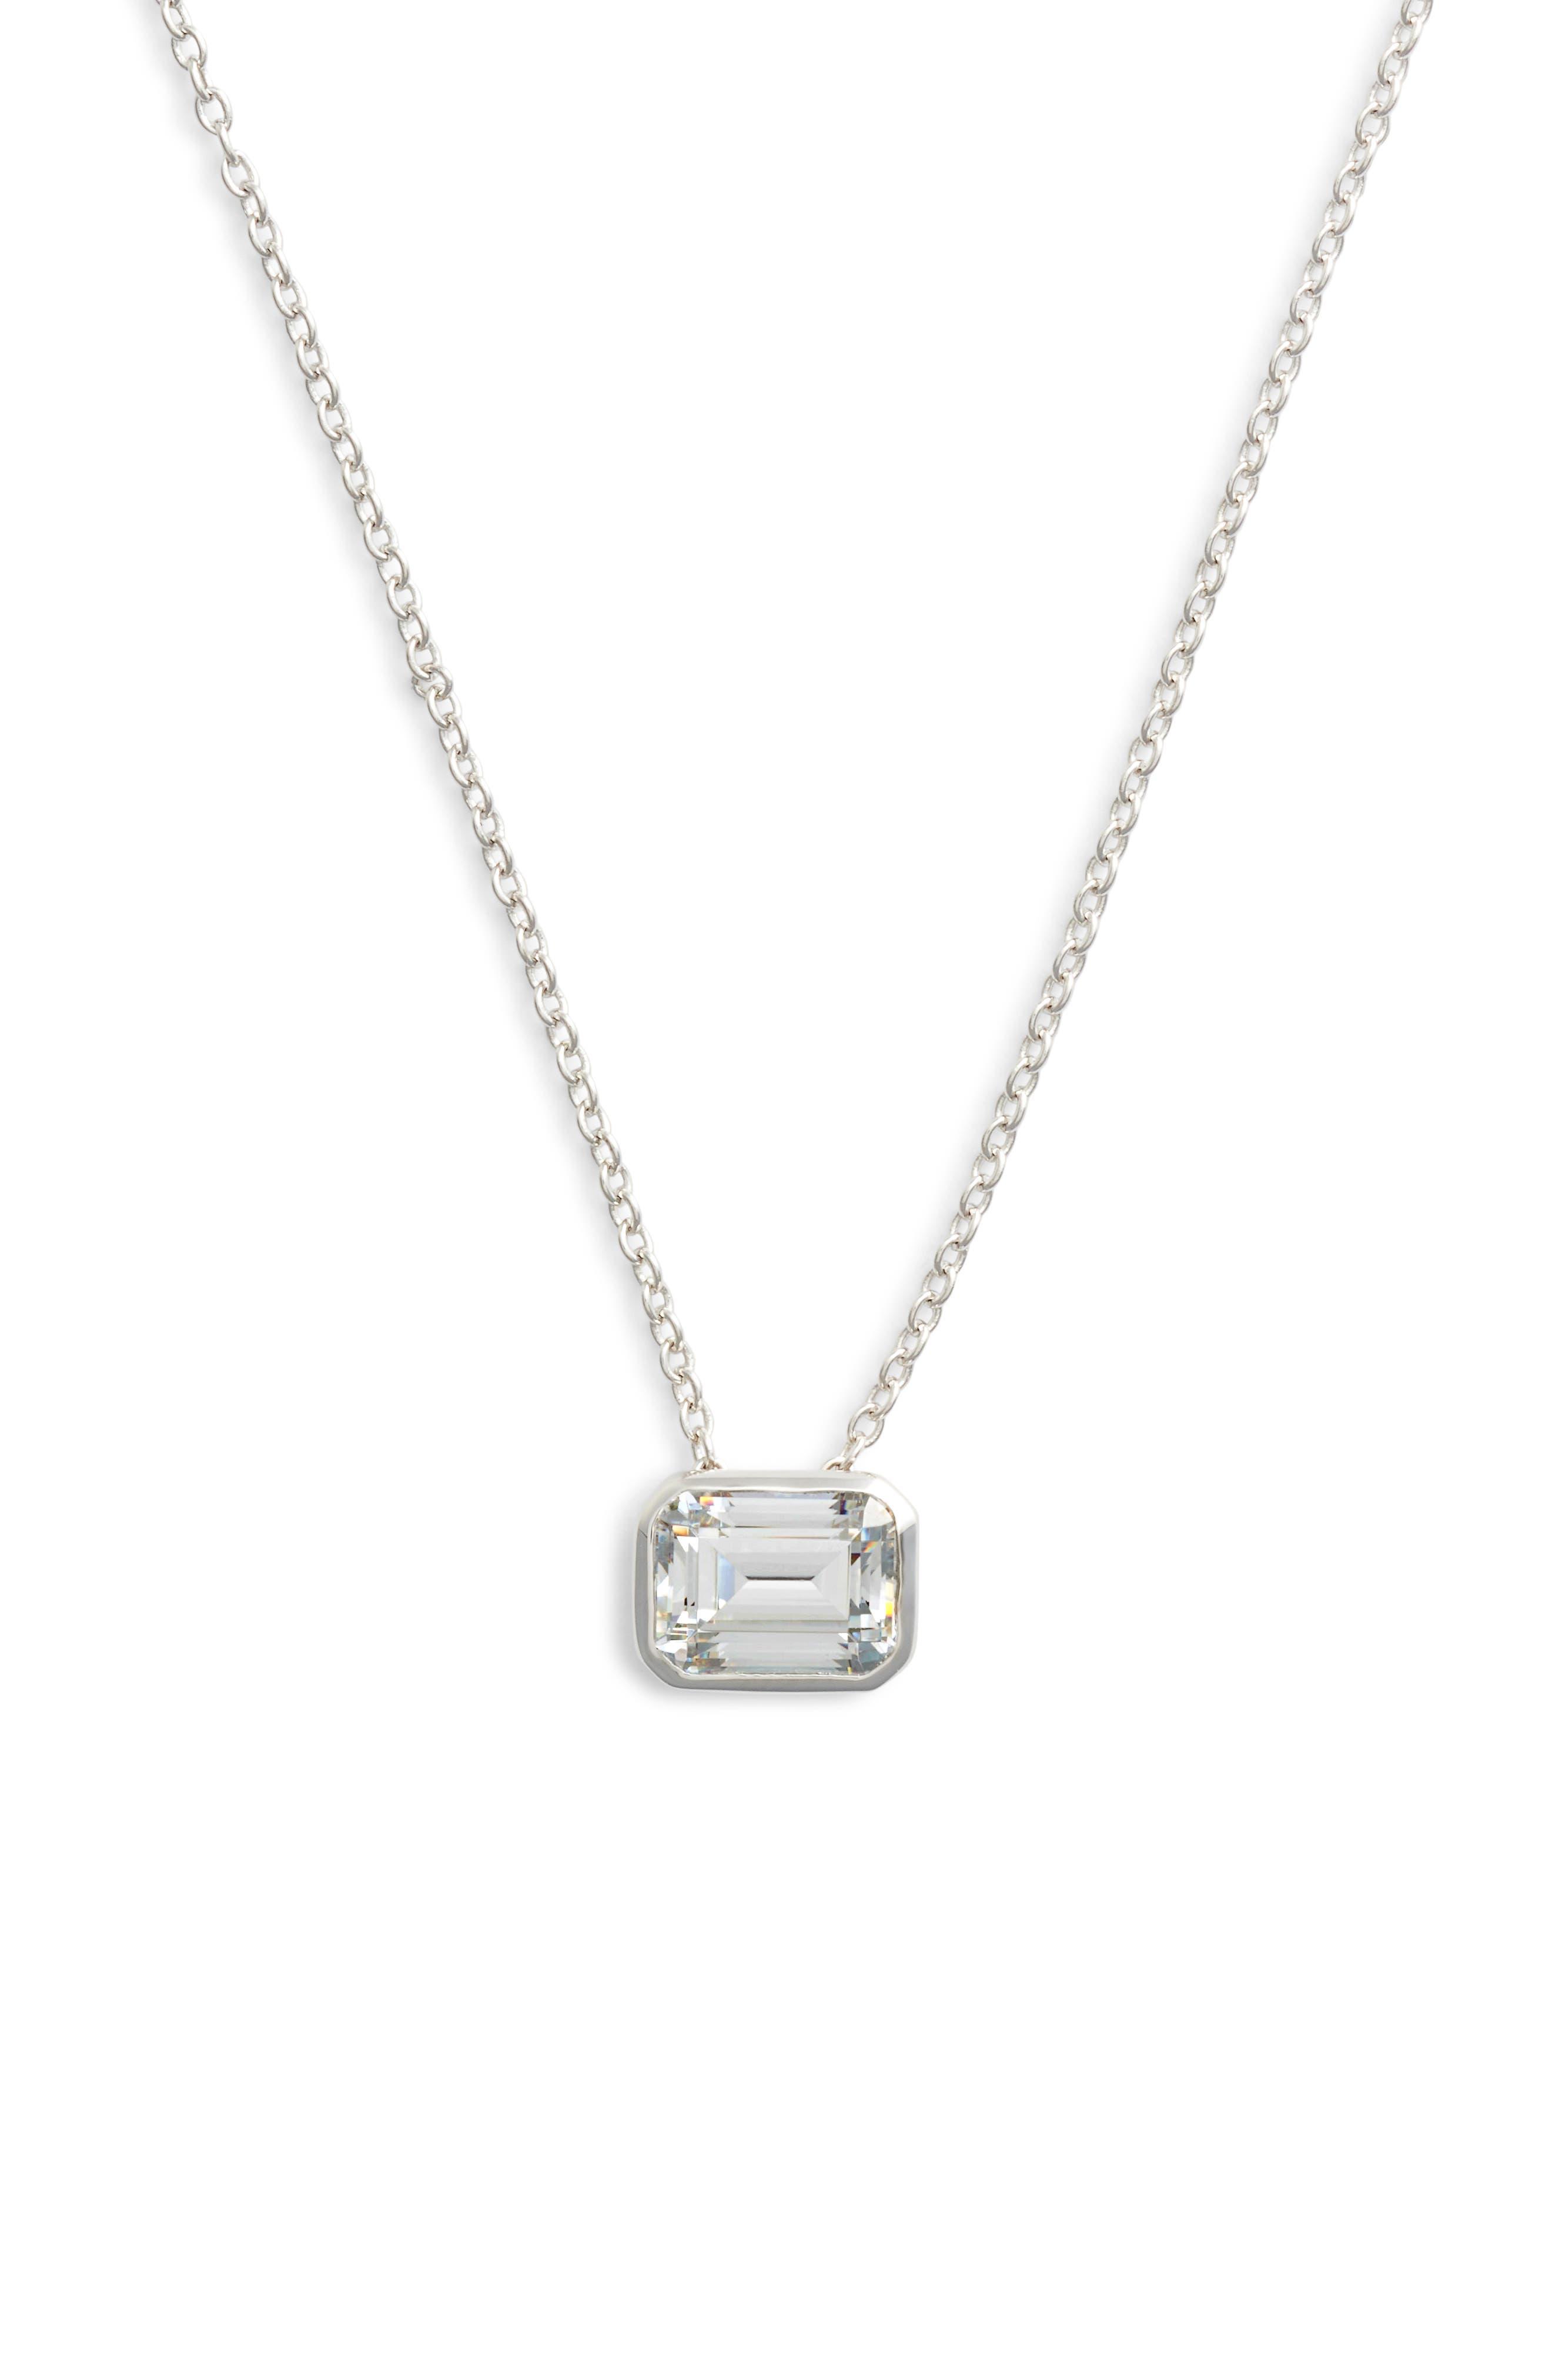 Bezel-Set Emerald-Cut Choker Necklace,                             Main thumbnail 1, color,                             SILVER/ CLEAR